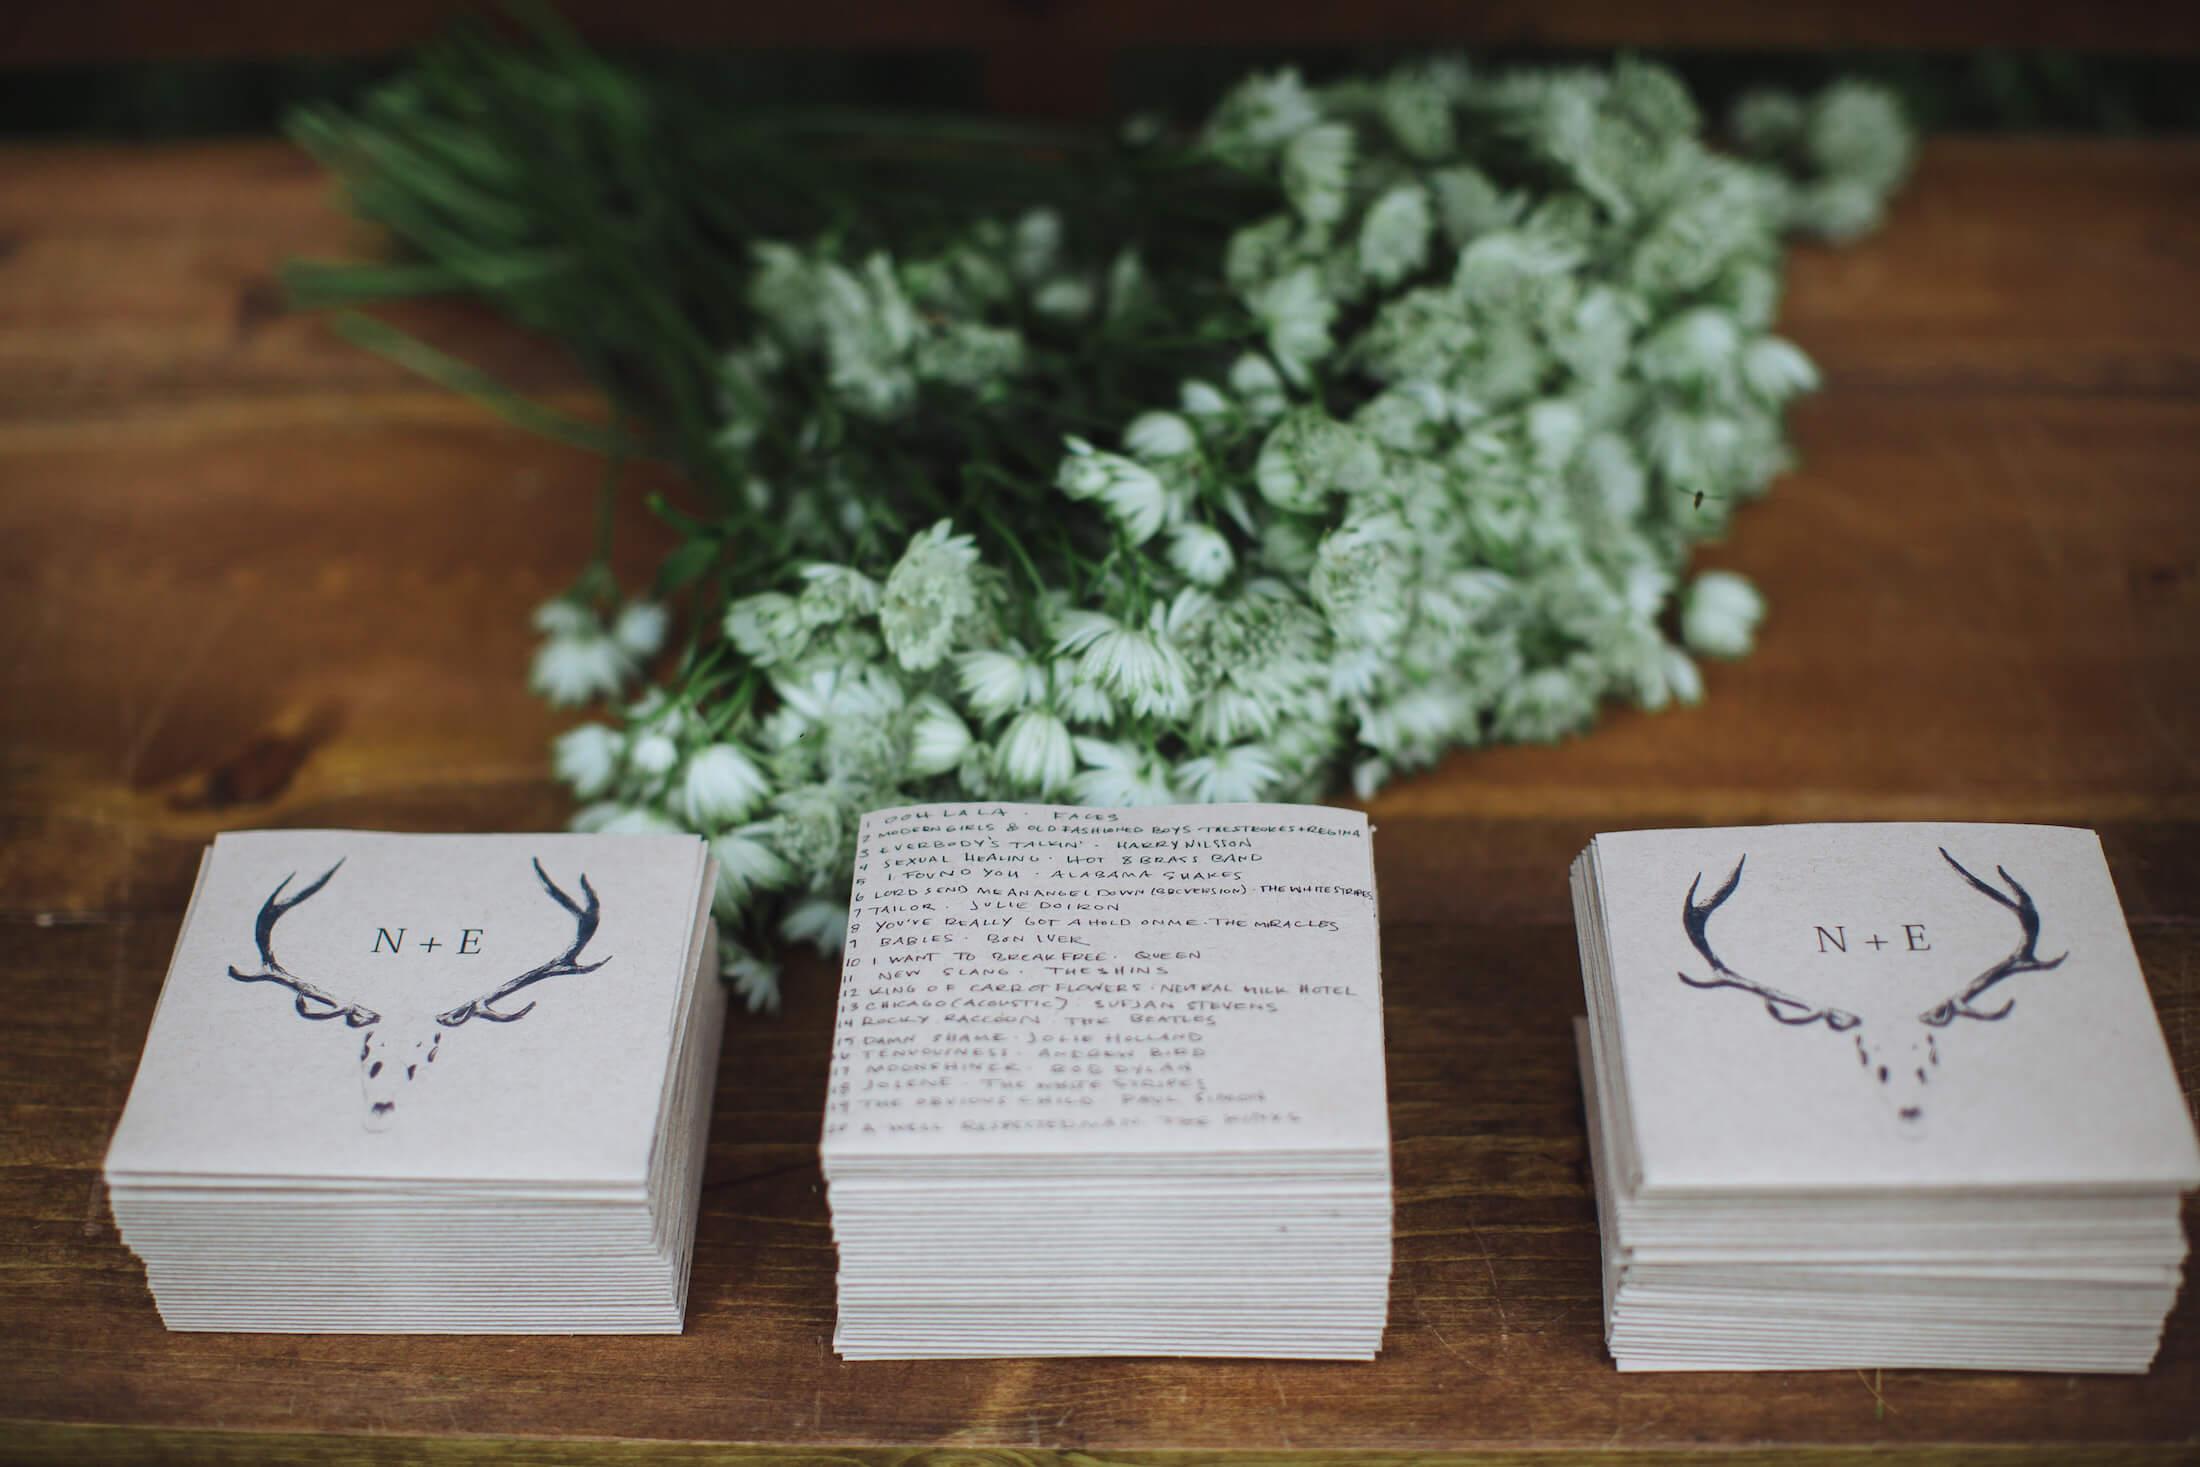 engle-olson-ray-kelly-photography-wisconsin-wedding-49.jpg